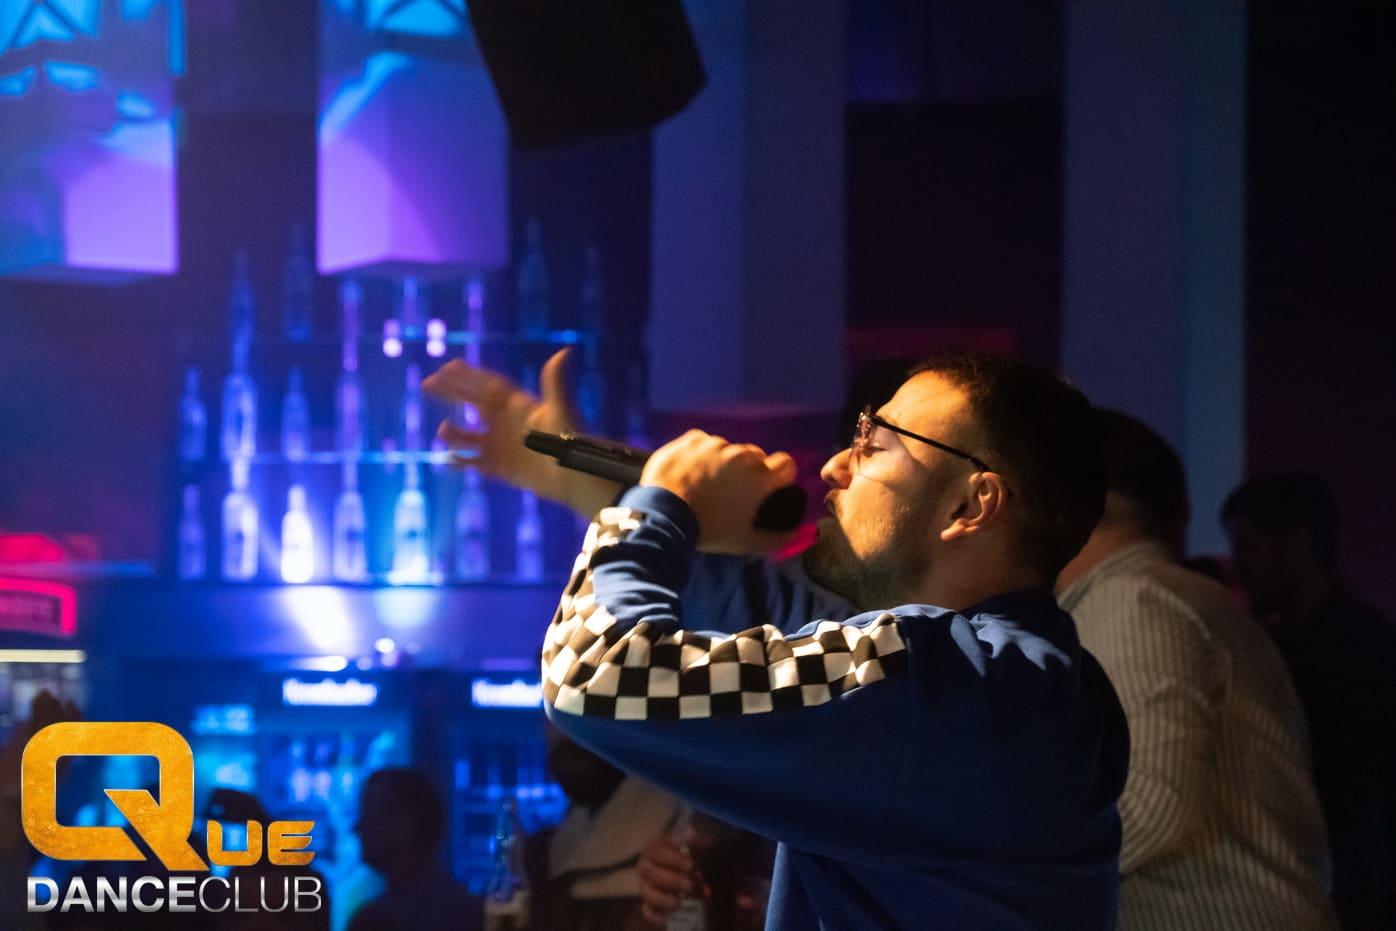 2018_12_08_Que_Danceclub_Paparazzo_Night_Ardian_Bujupi_Live_Nightlife_Scene_Timo_053